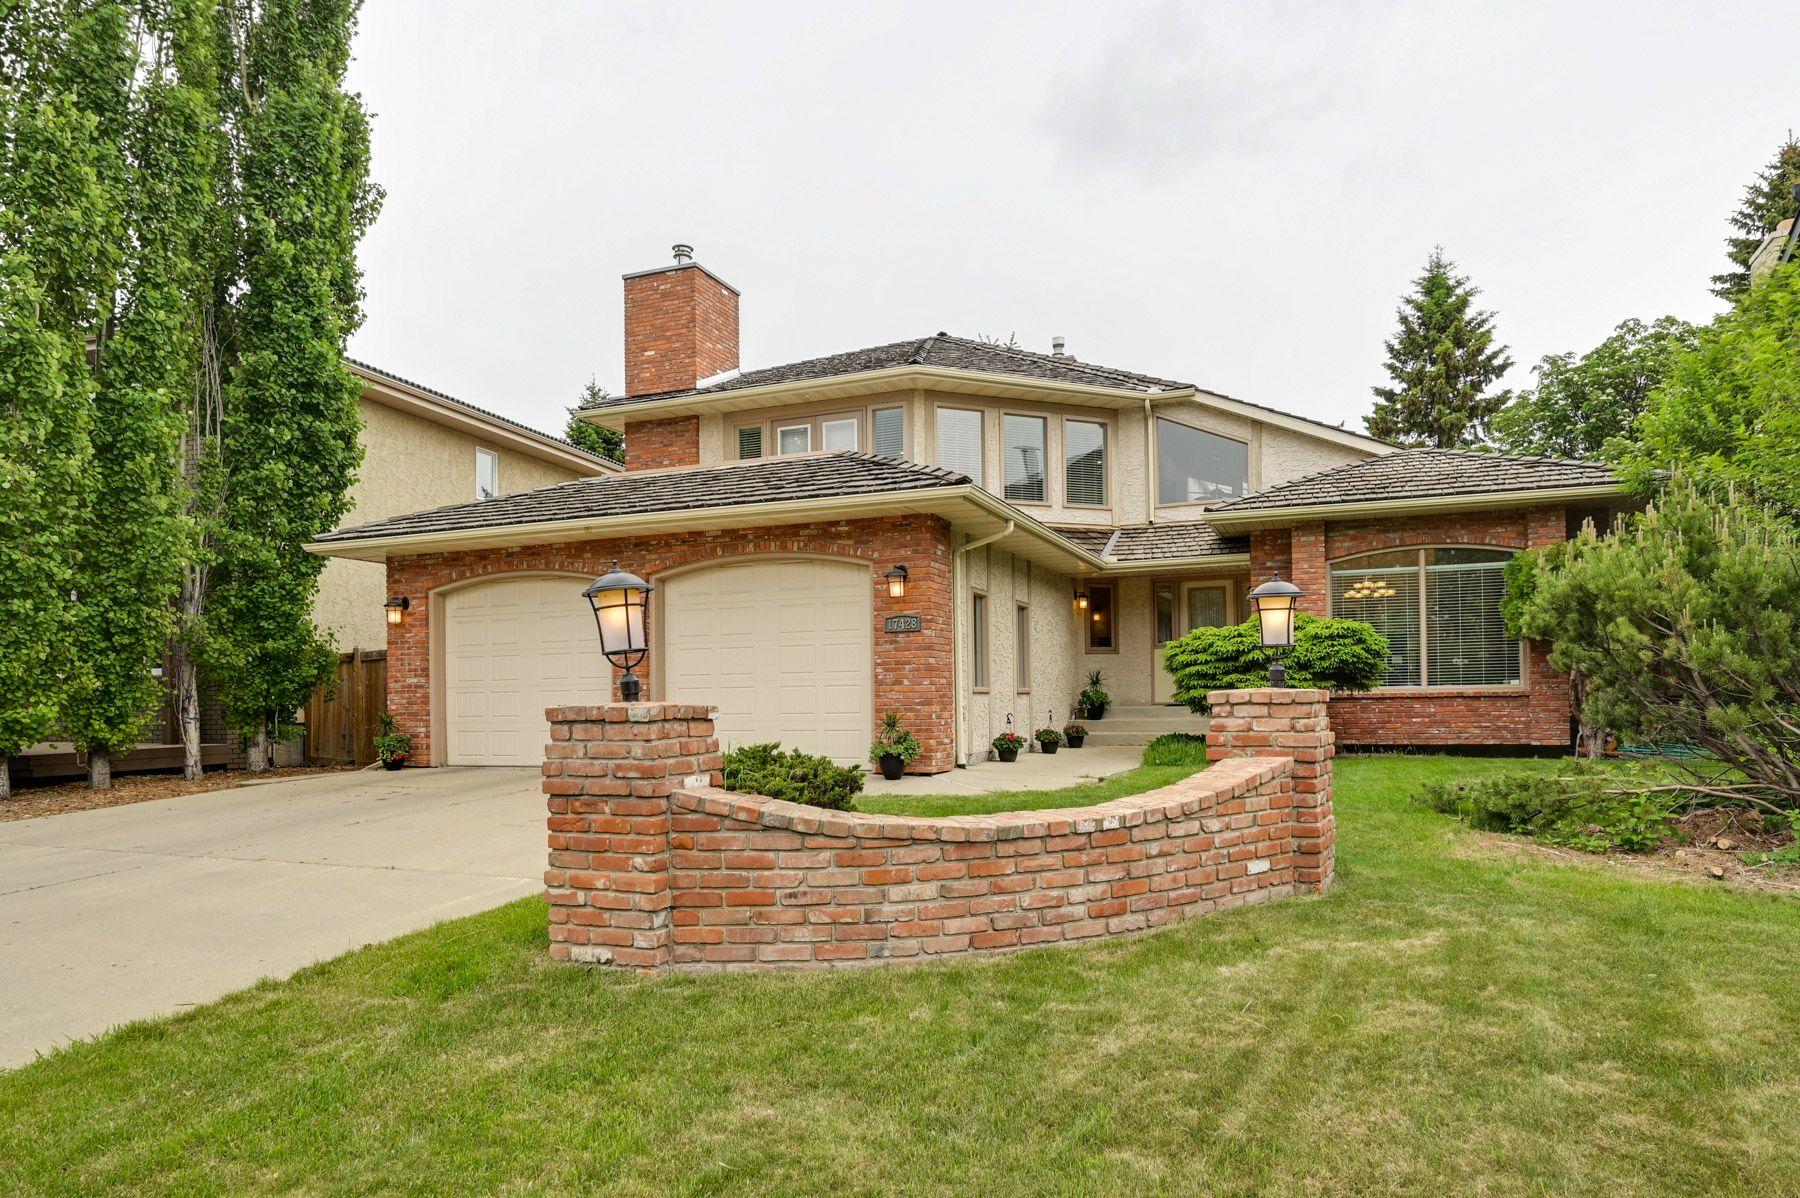 Main Photo: 17428 53 Ave NW: Edmonton House for sale : MLS®# E4248273